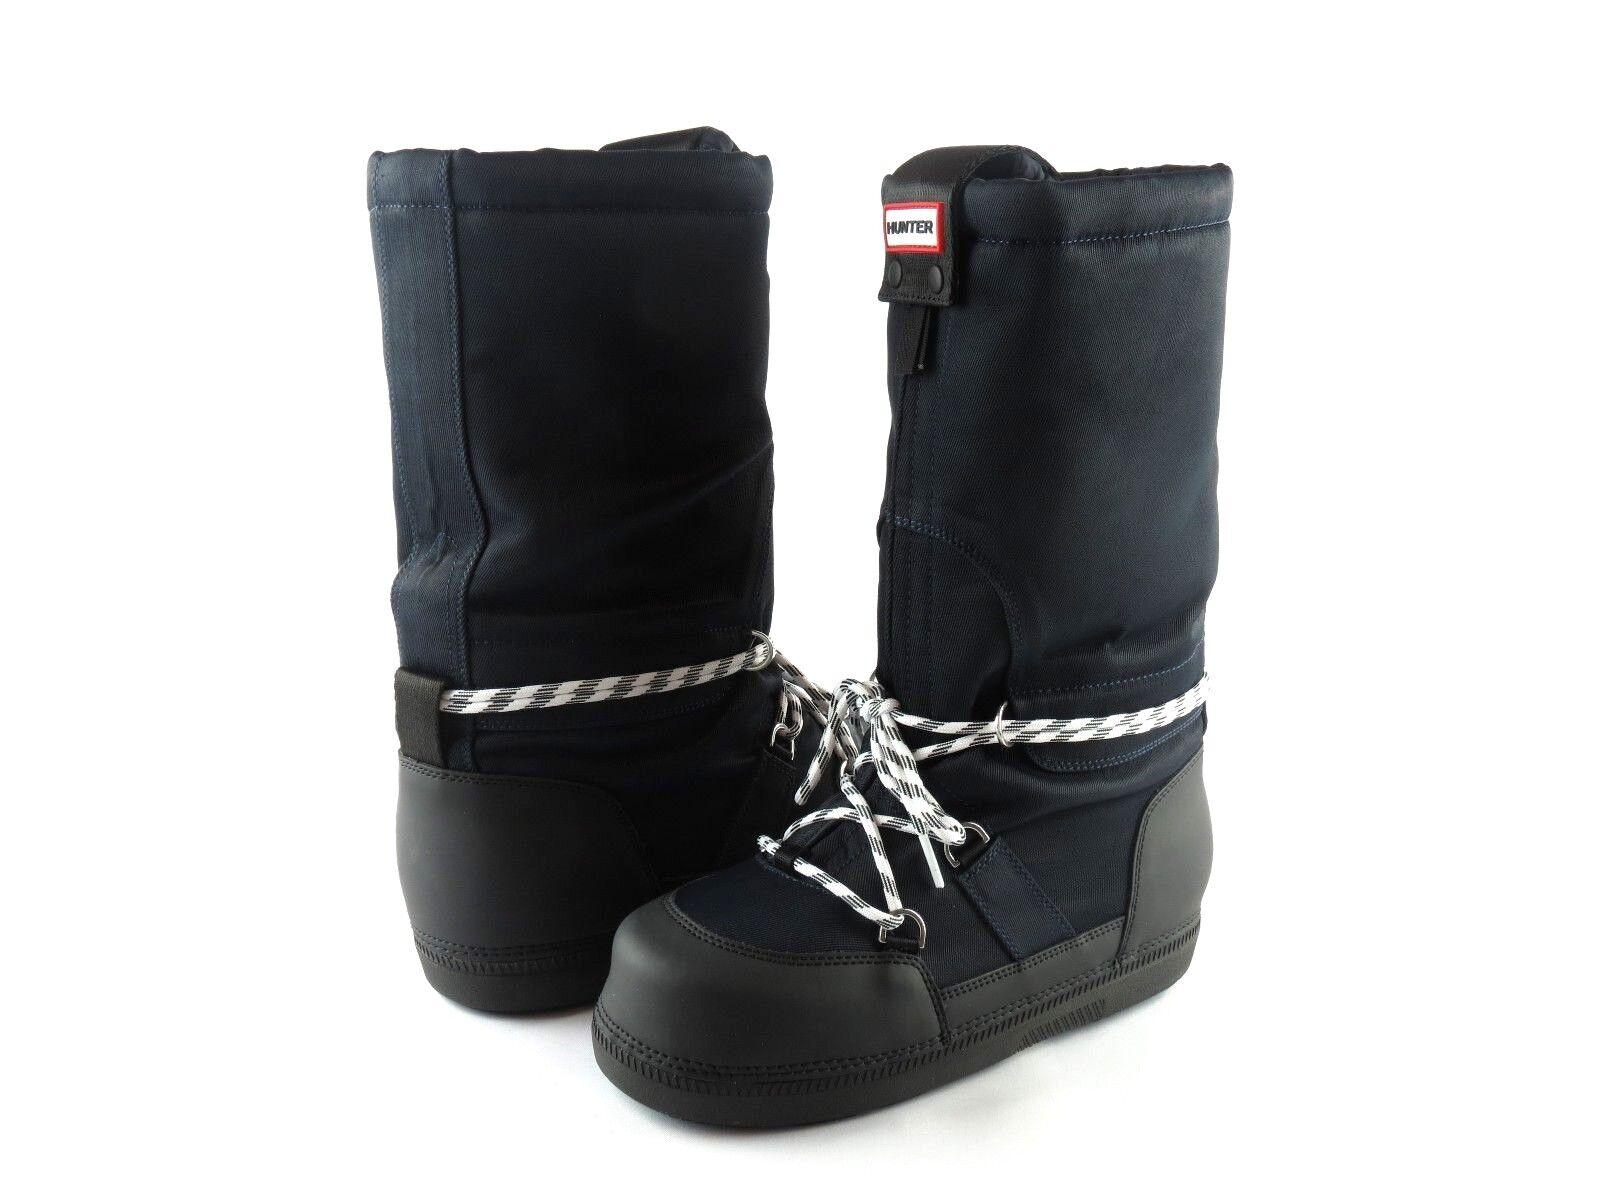 Nueva Hunter Original Short Mujer 's us 9 Boot Rain Boot 9 Dark ion rosa zapatos botas 0ff8c7